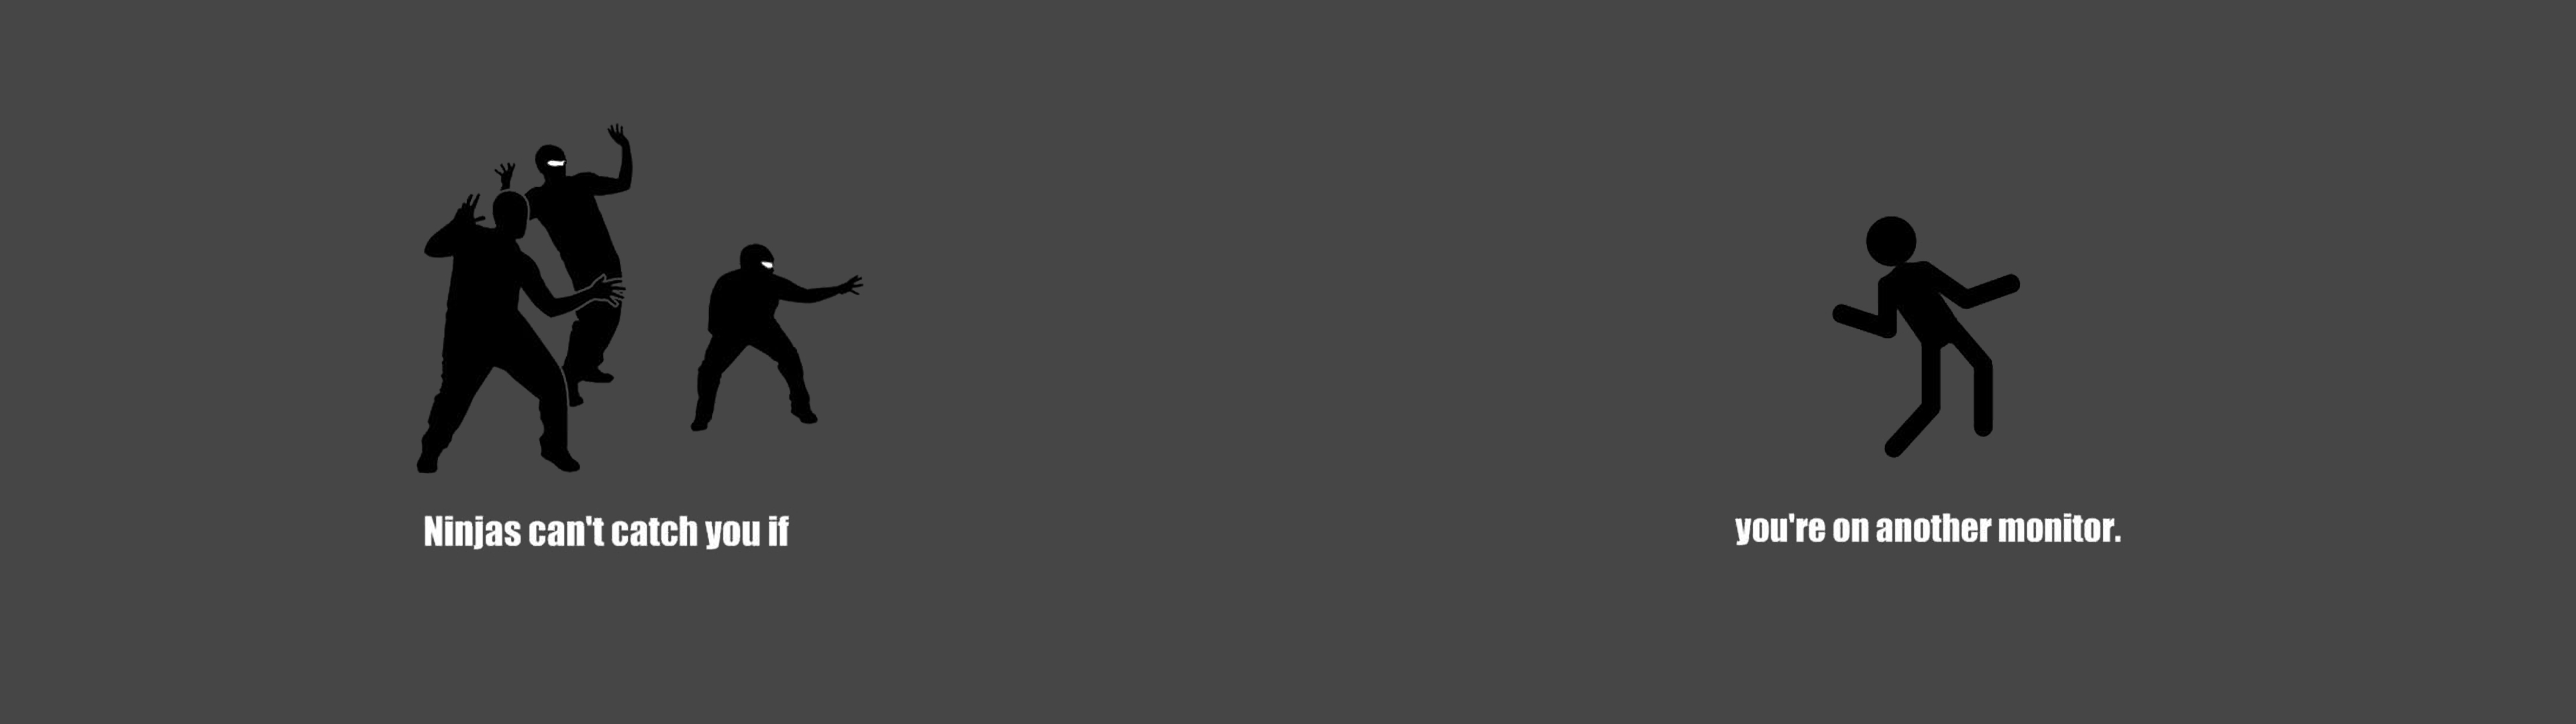 Dual monitor wallpapers anyone   Album on Imgur 3840x1080